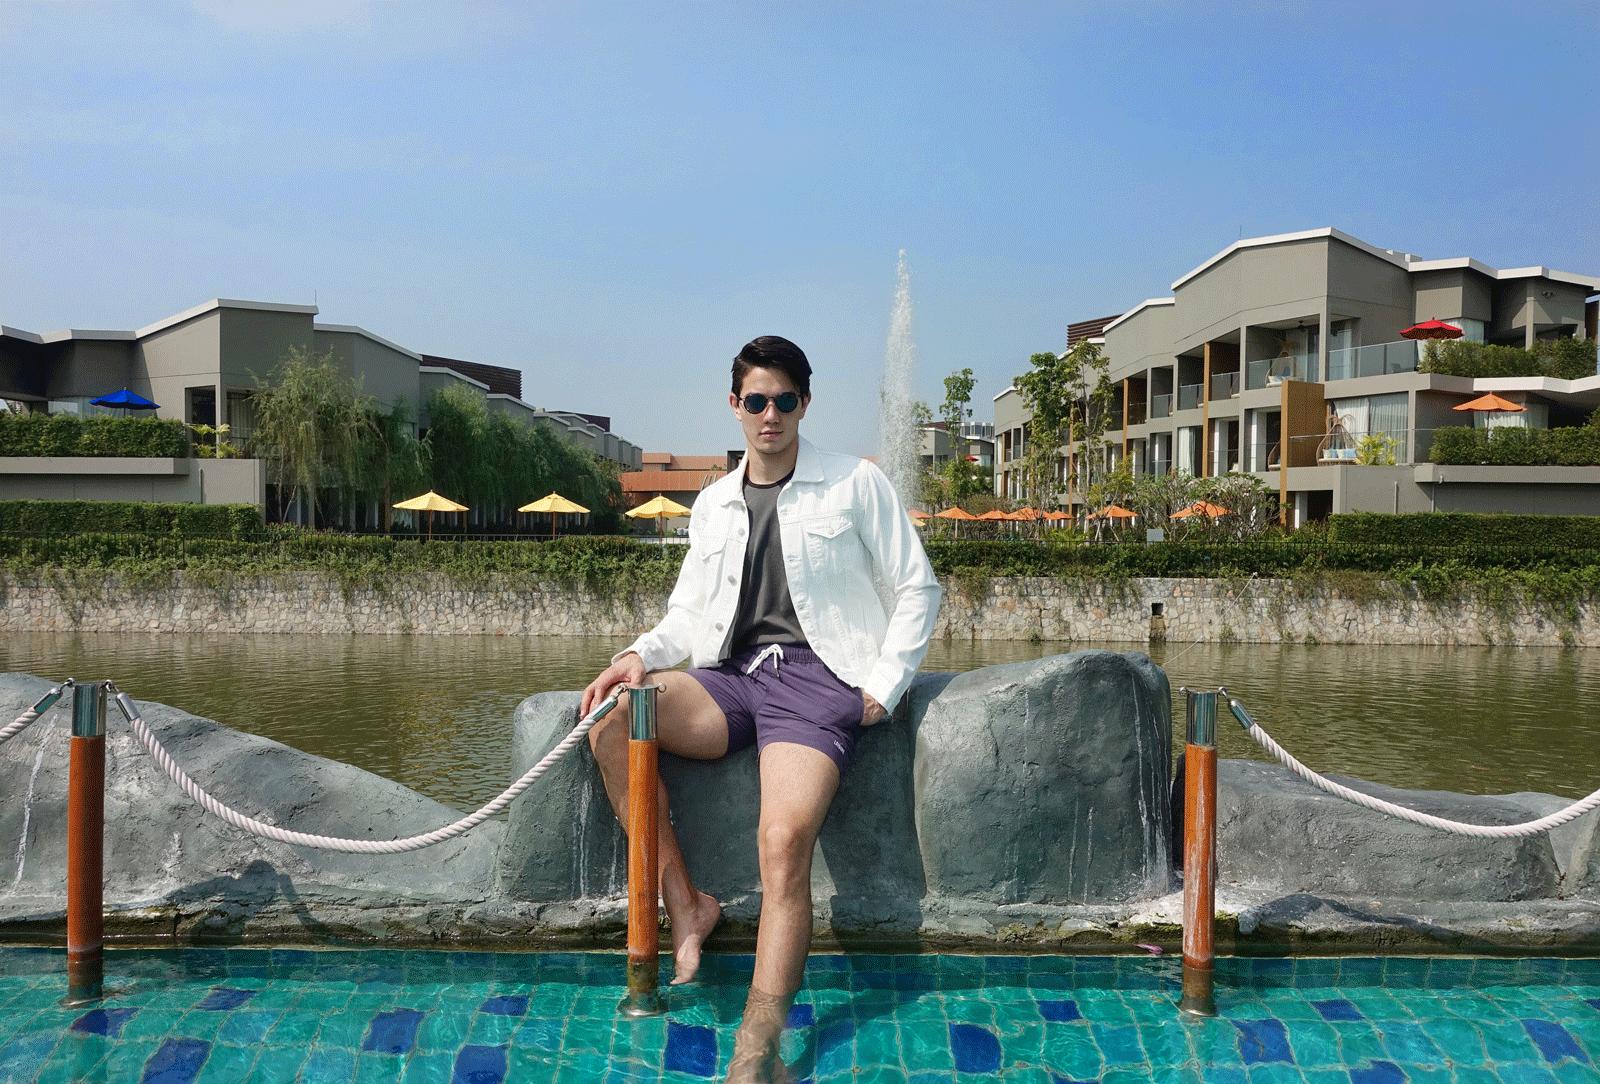 jacket : CV_homme / tank top : NOXX / shorts : Leisure Projects / sunglasses : TAVAT